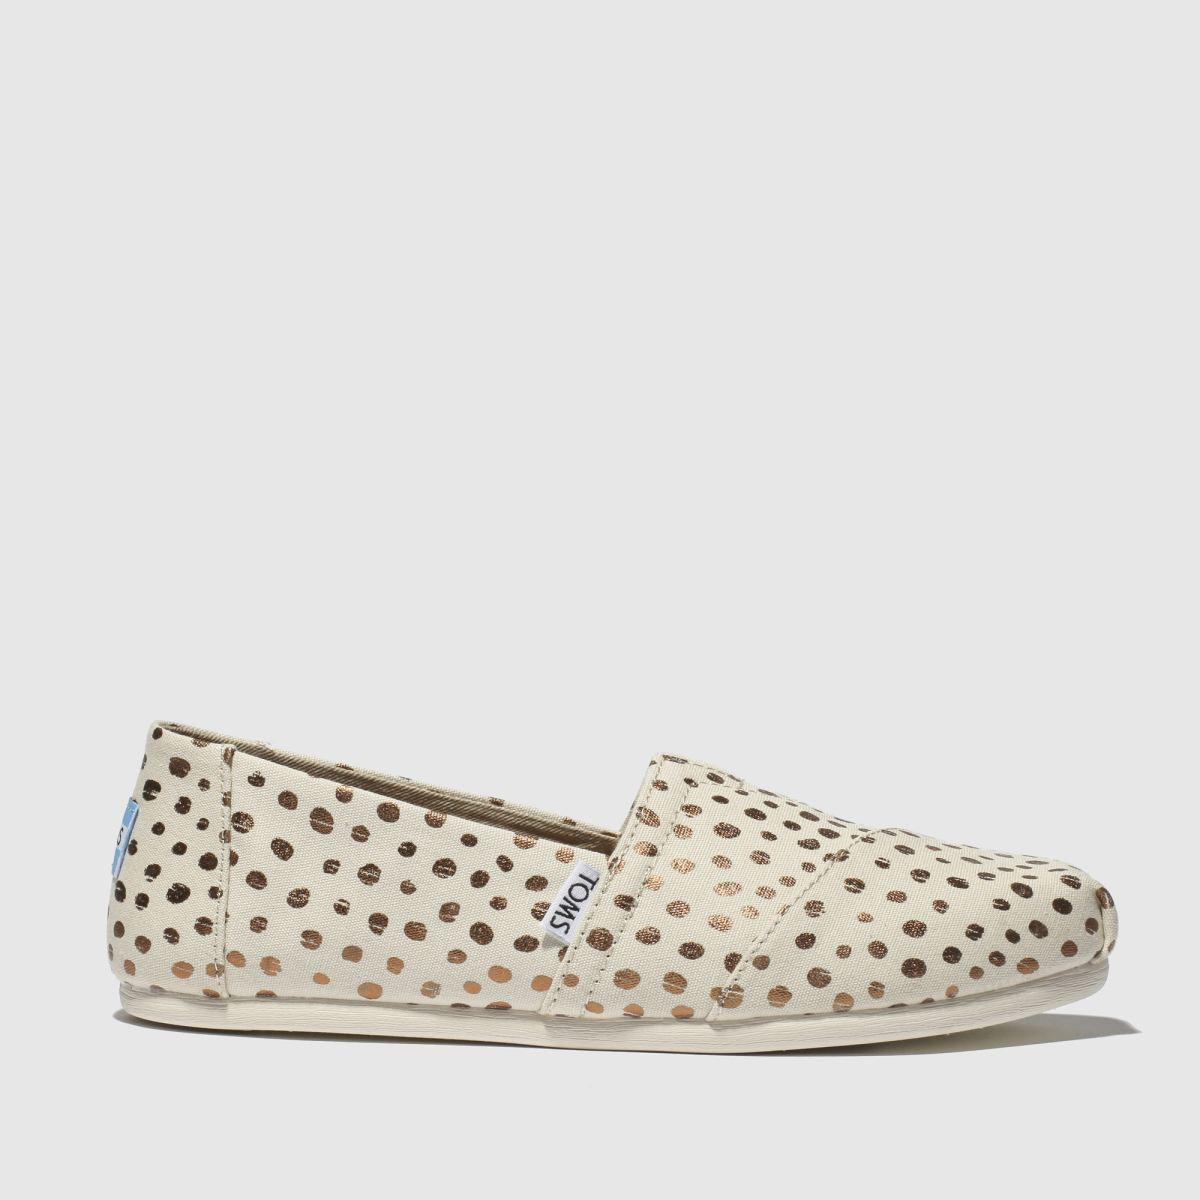 Toms White & Gold Alpargata Flat Shoes